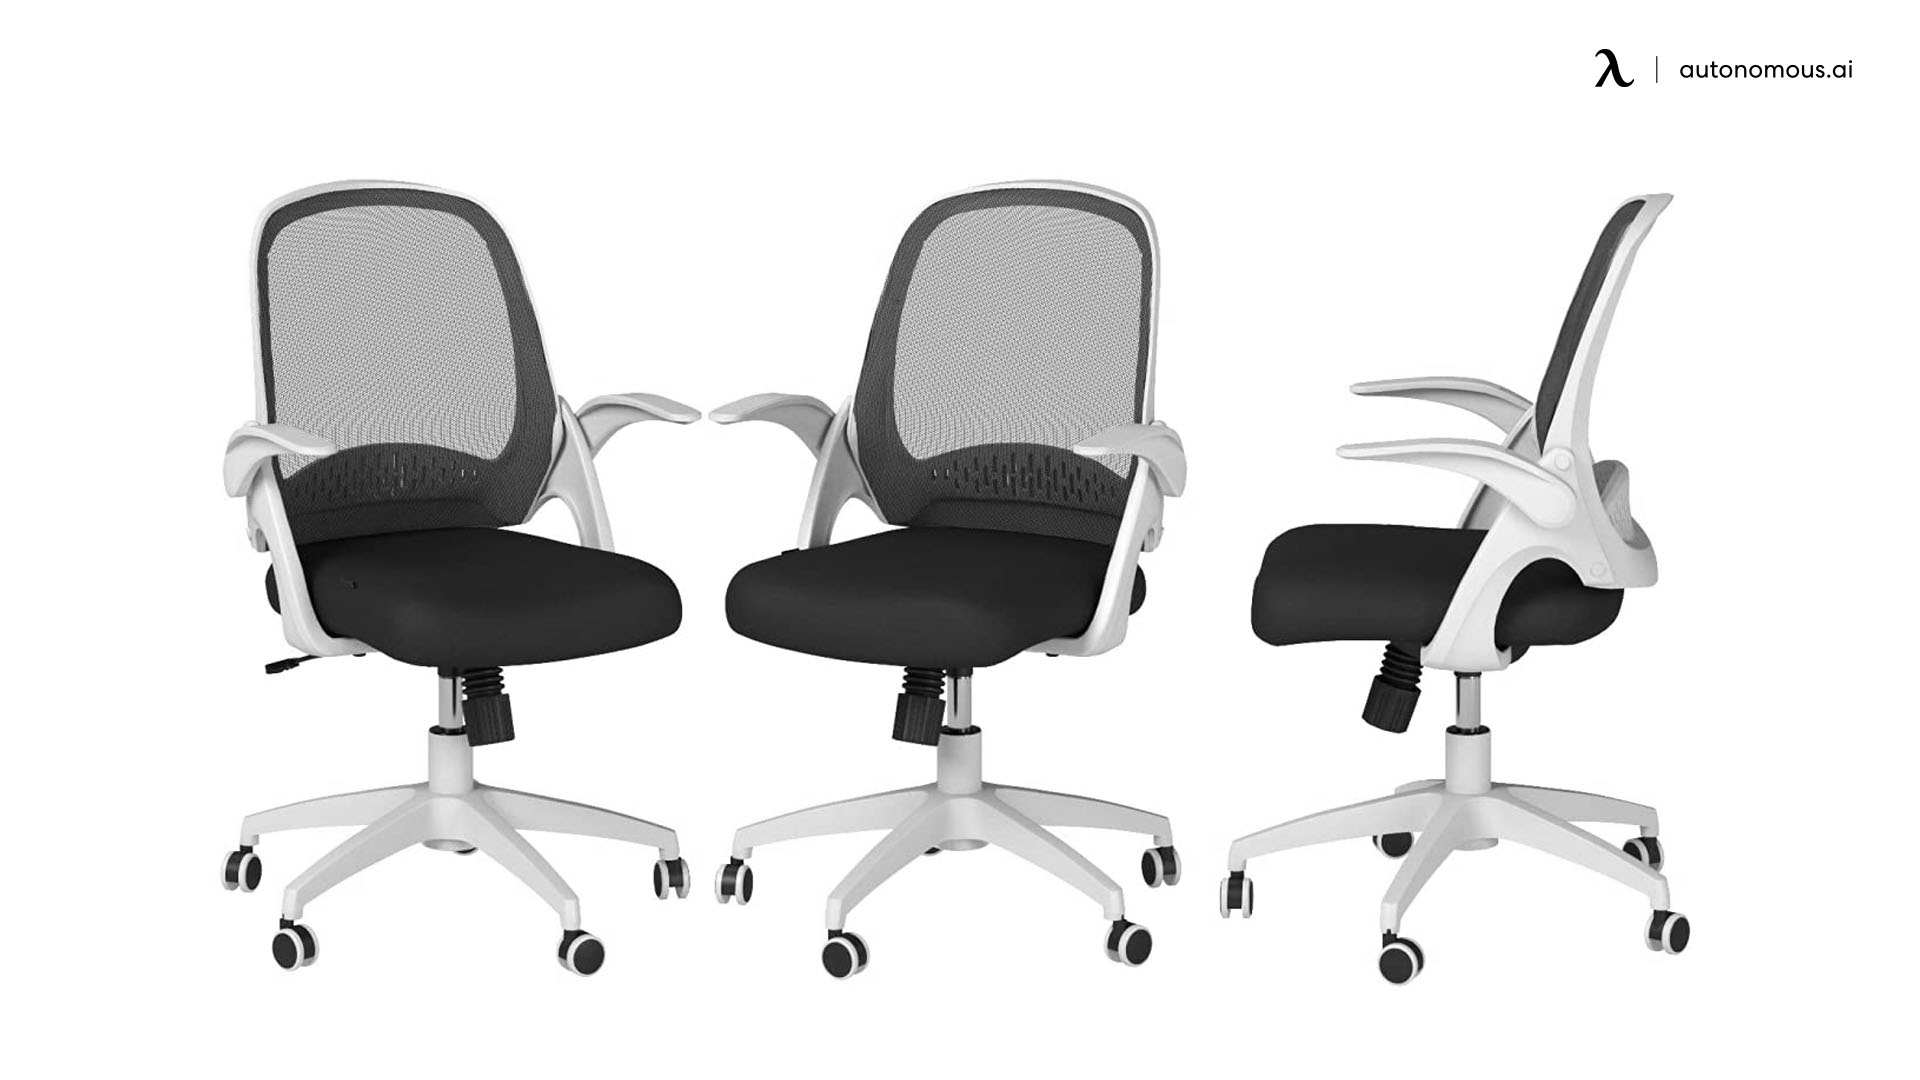 Office task desk chair by HBADA